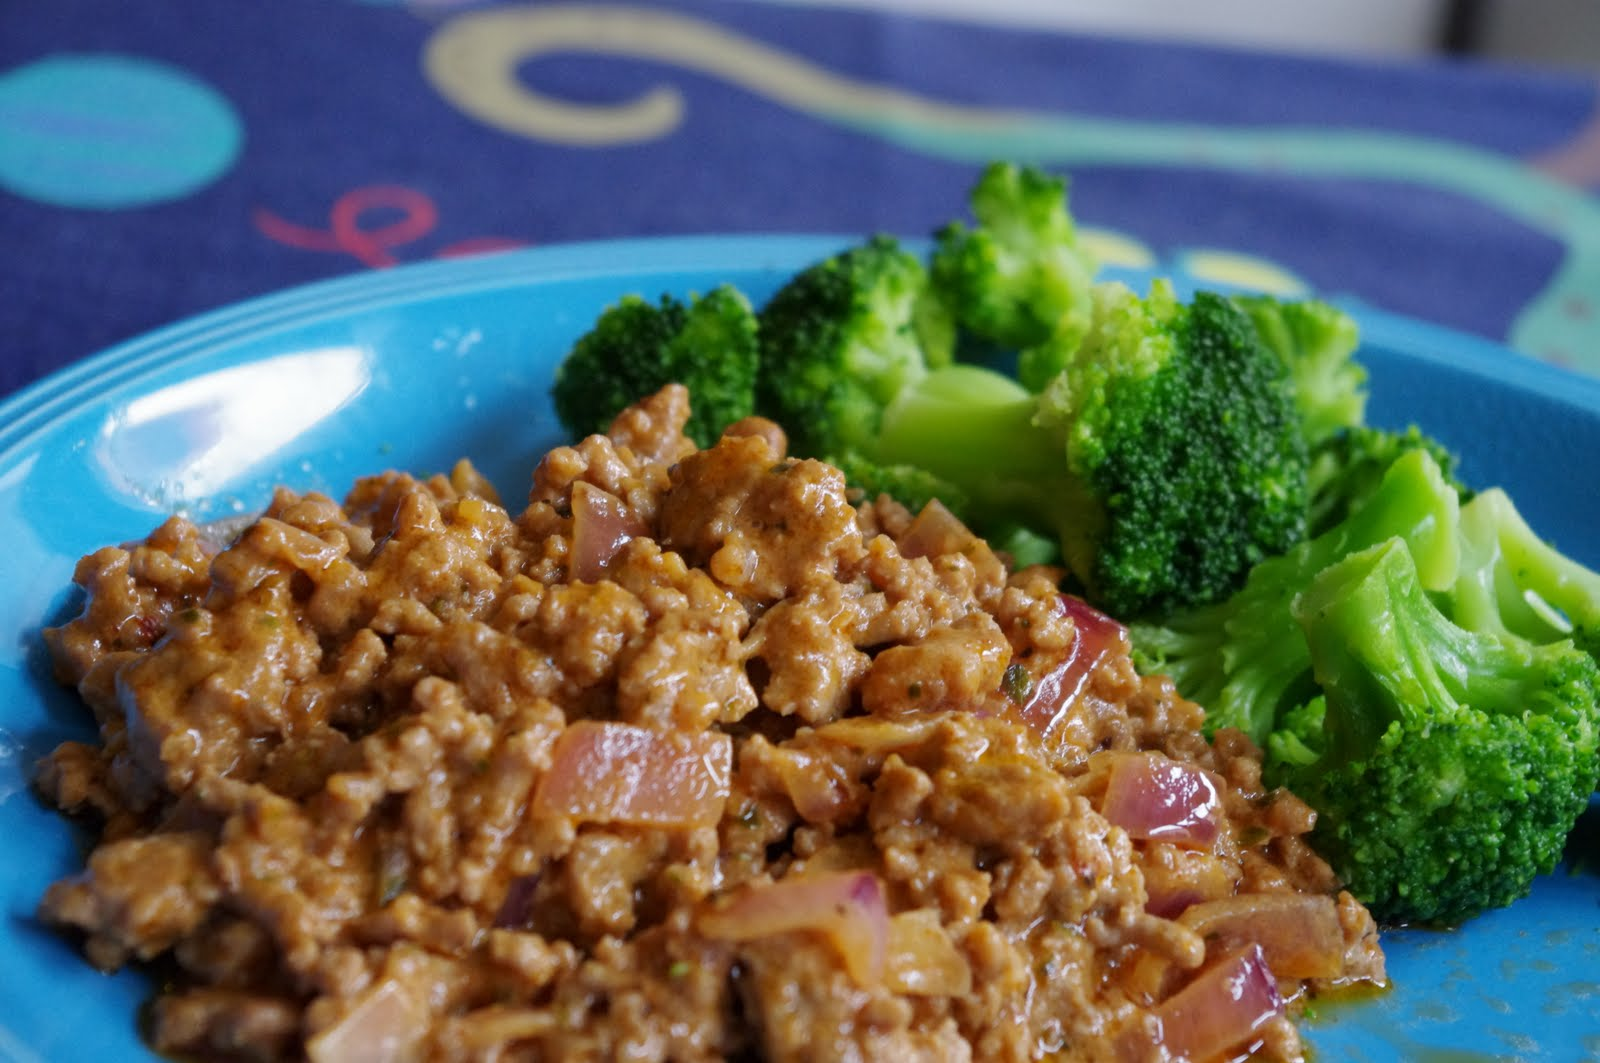 mättande mat med få kalorier